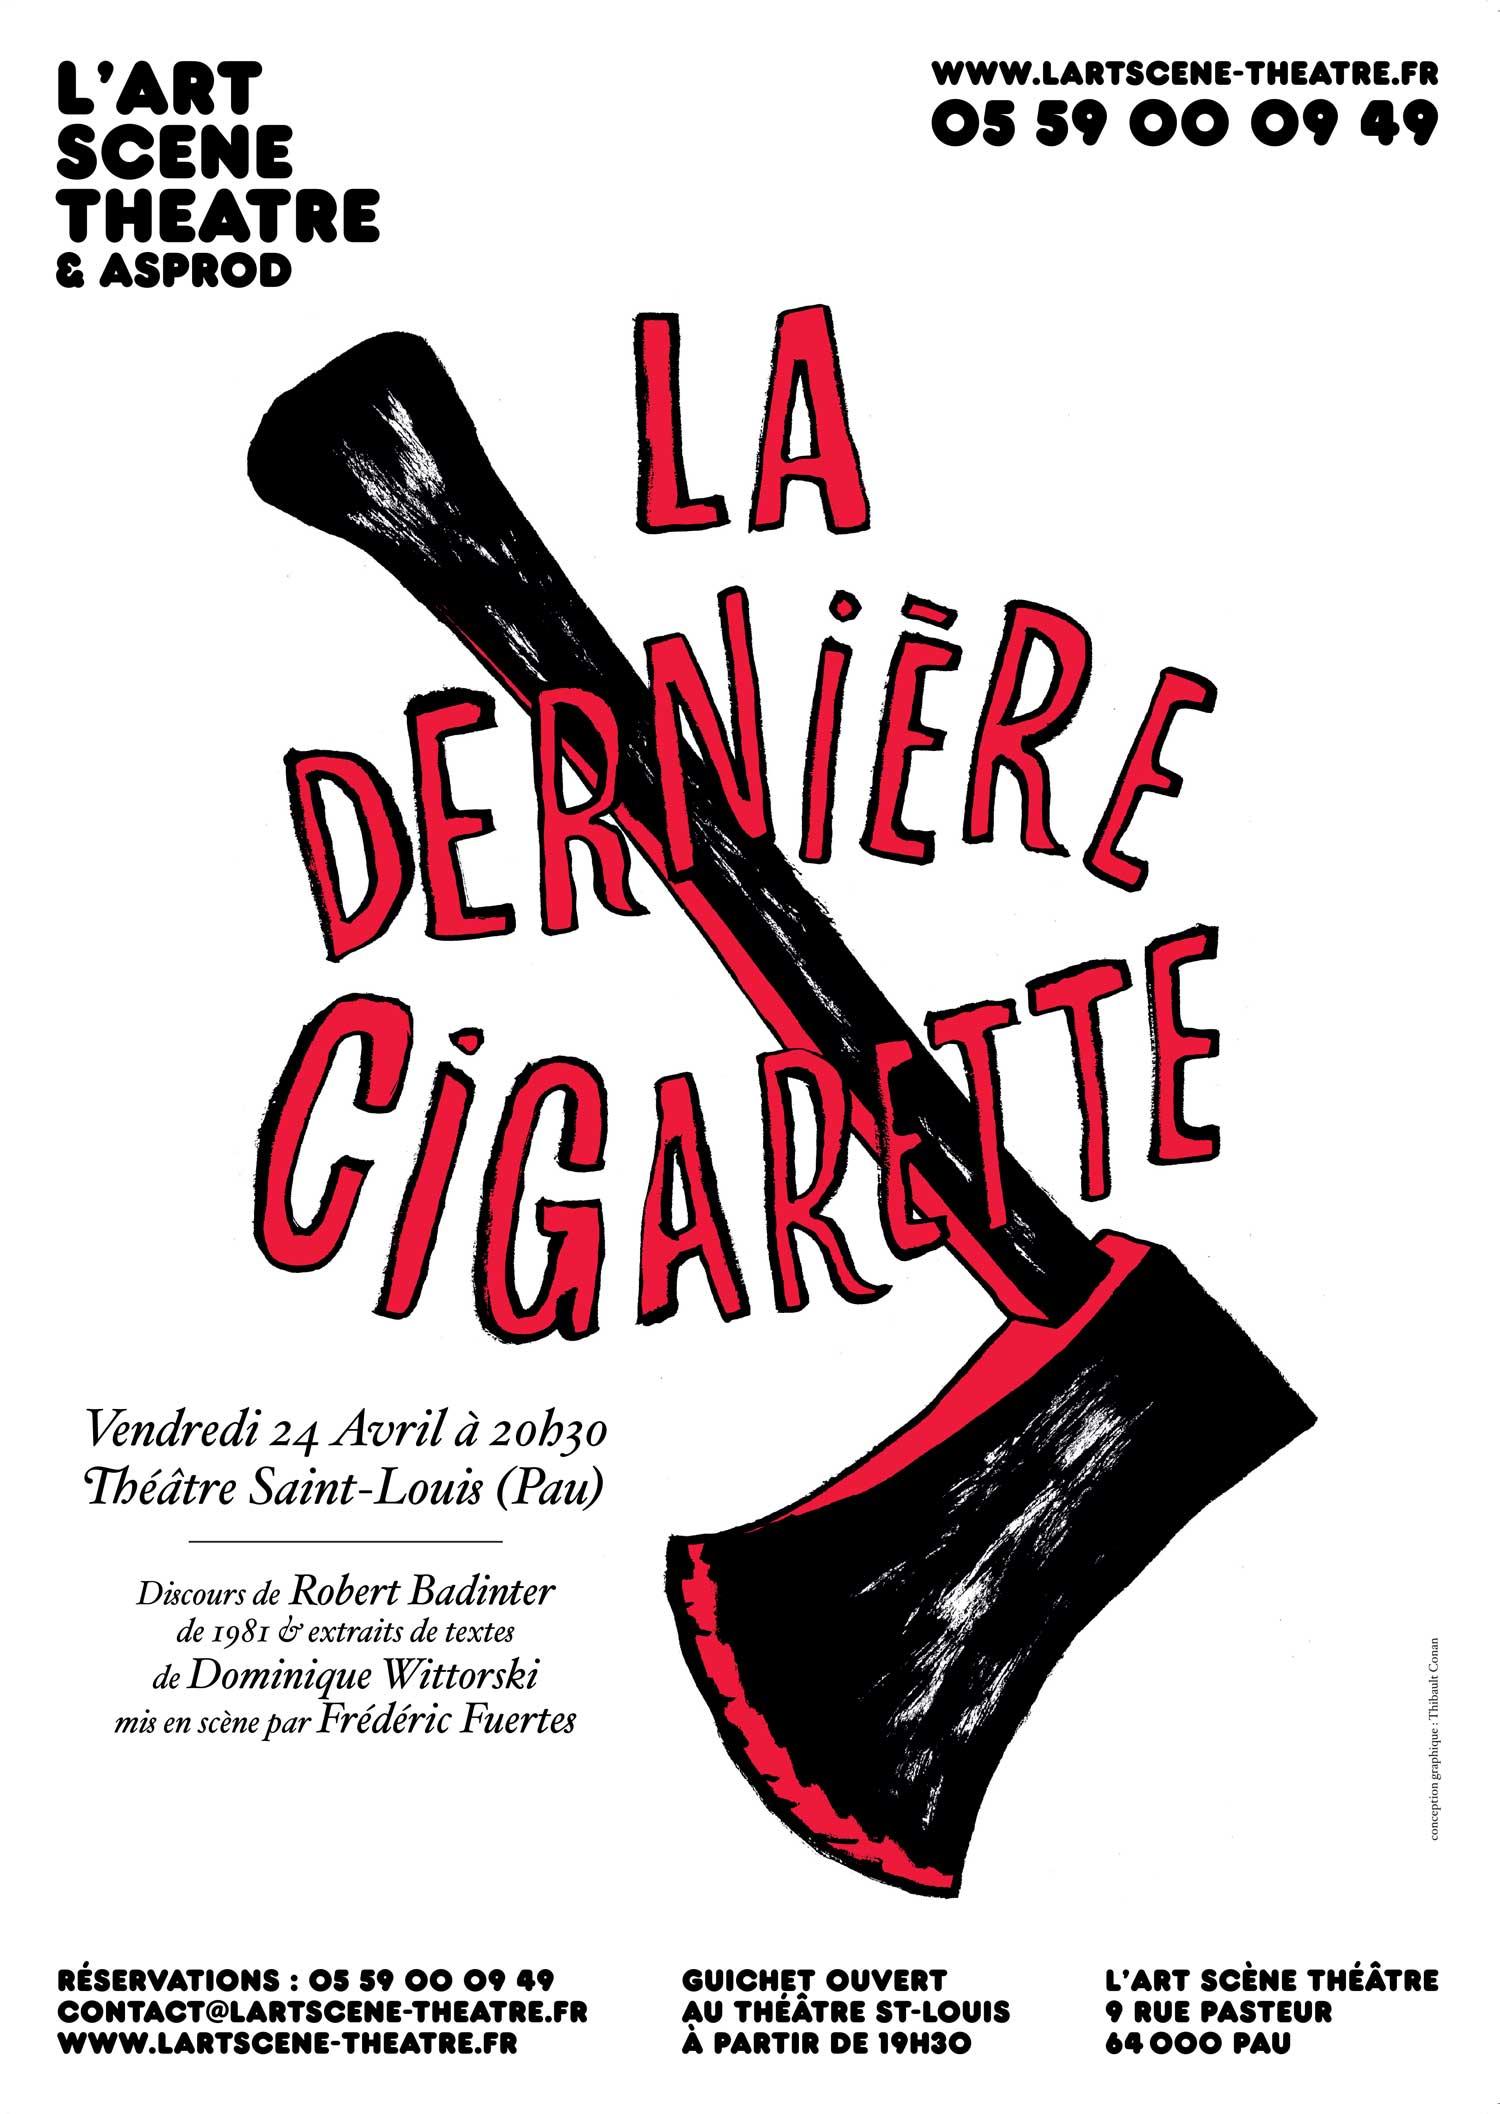 Derniere-Cigarette-A3-135gx250ex